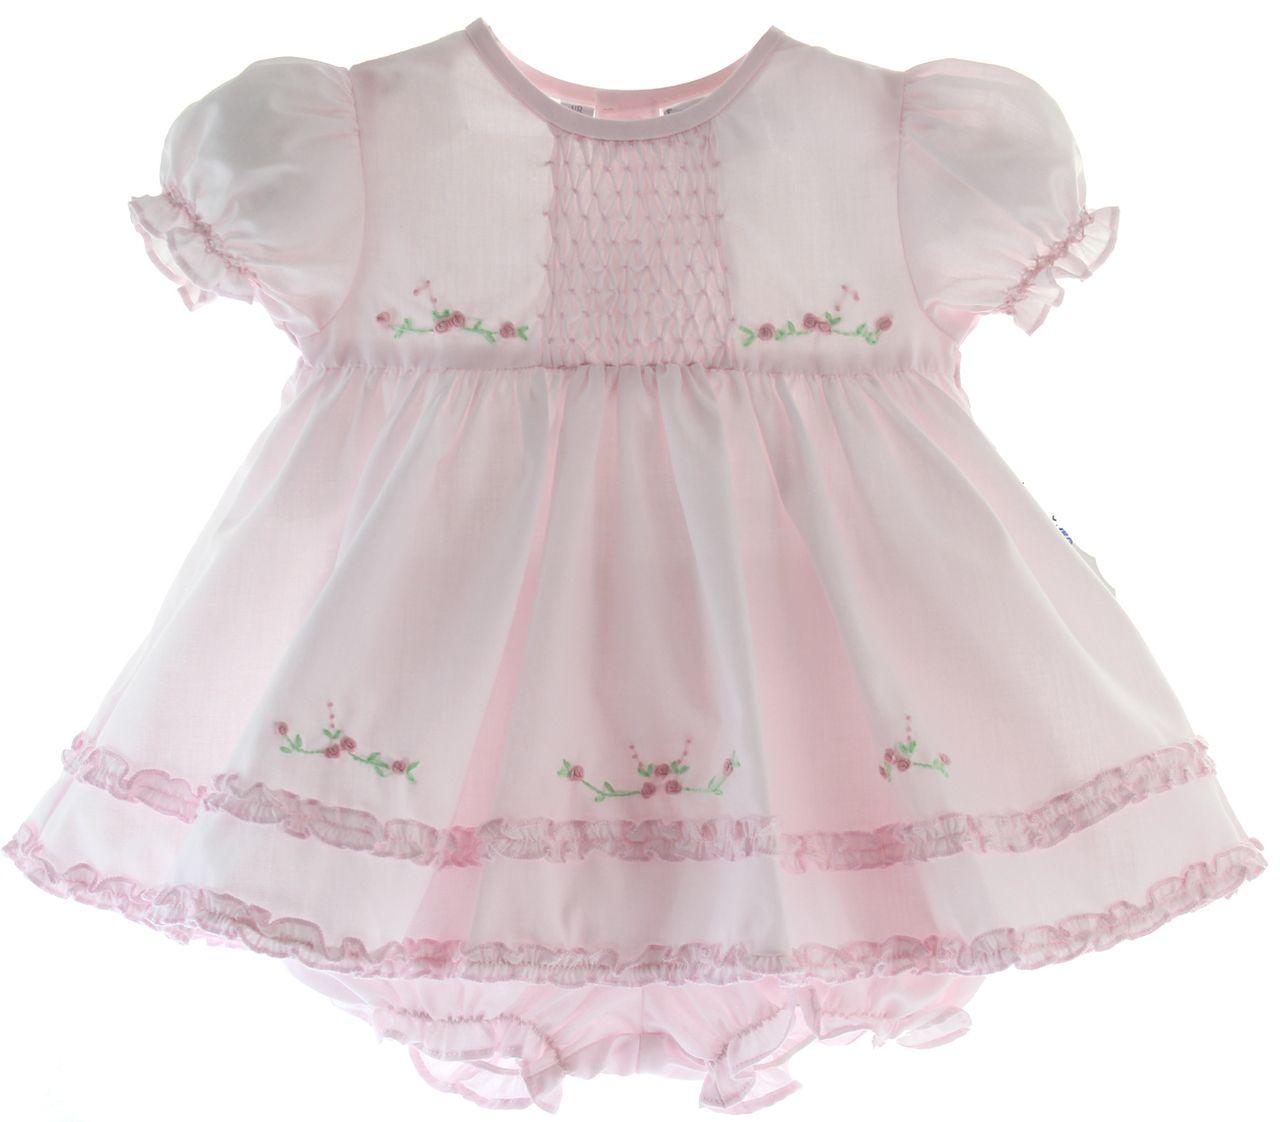 Pink dress baby  Baby Girls Pink Dress u Bloomer Set  Friedknit Creations by Feltman